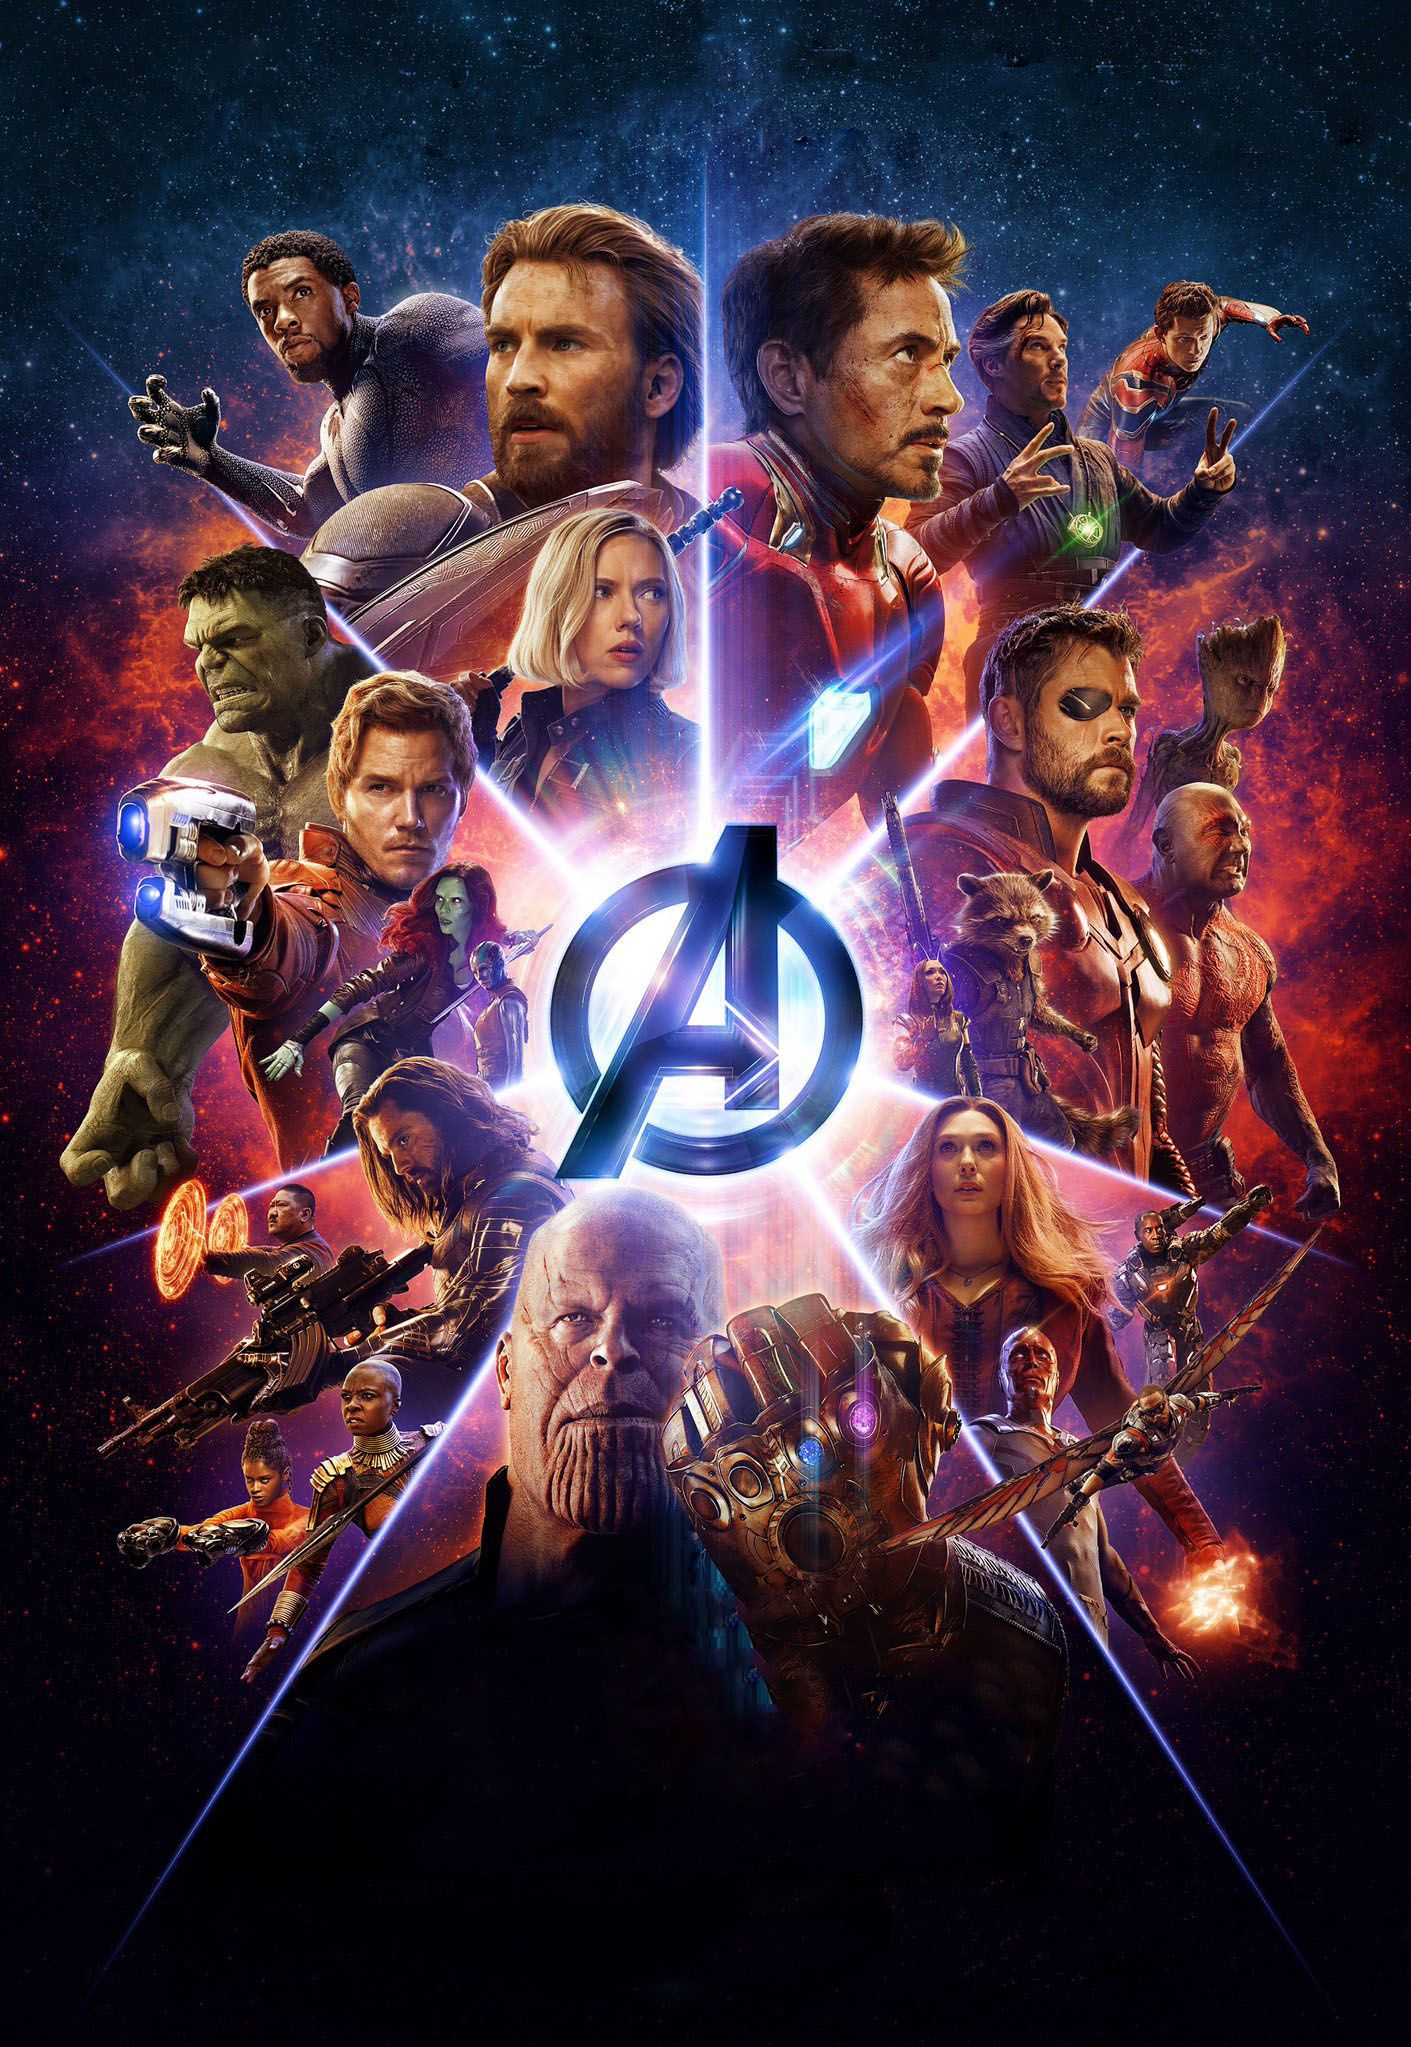 Avengers Infinity War Textless Imax Poster Avengers Film Avengers Film Posters Avengers